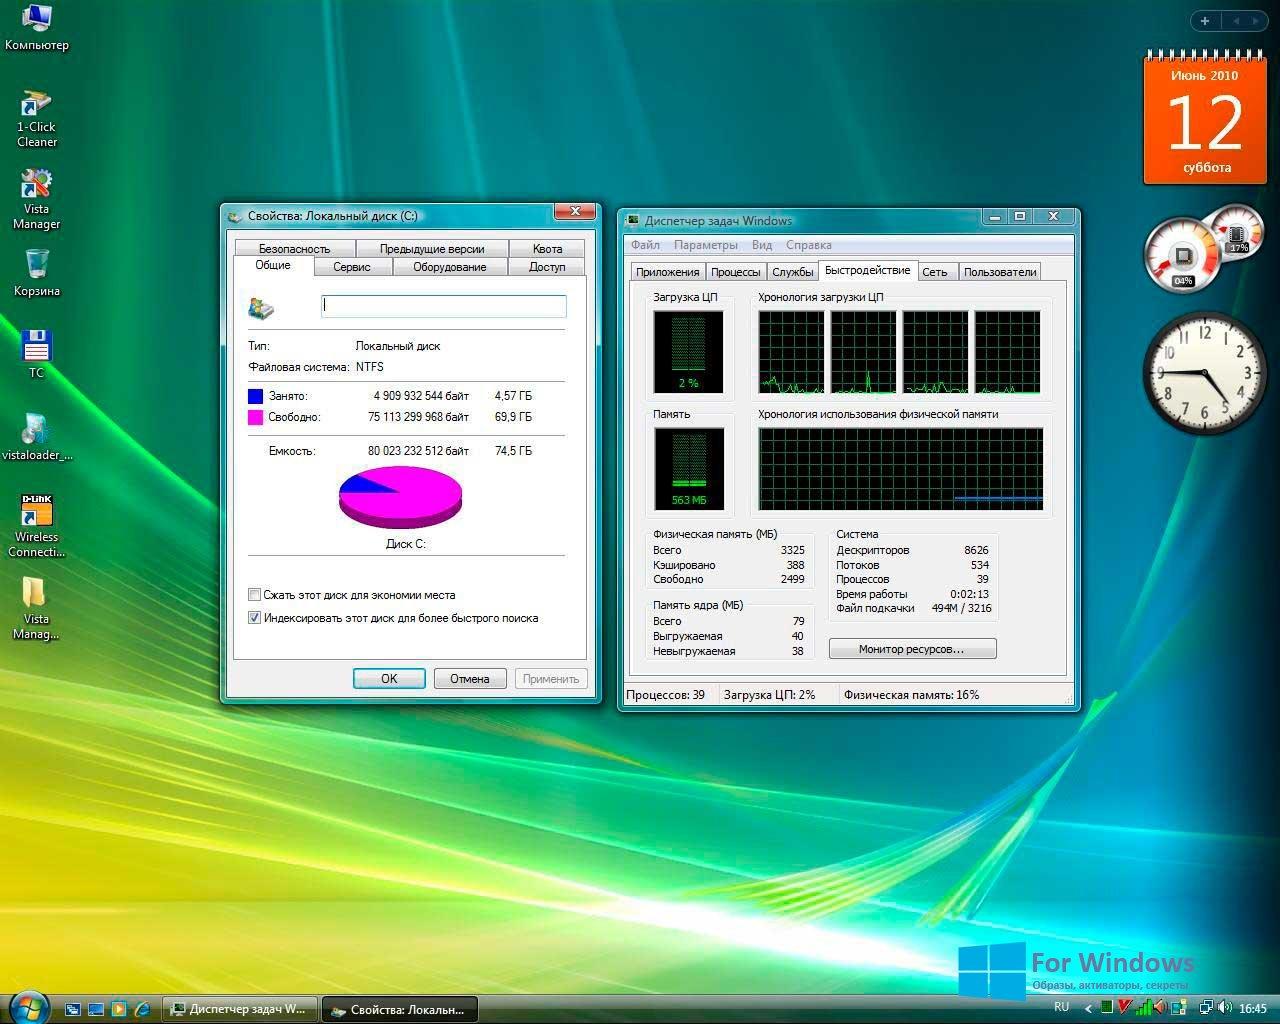 Windows vista free download 32 bit 64 bit full version.